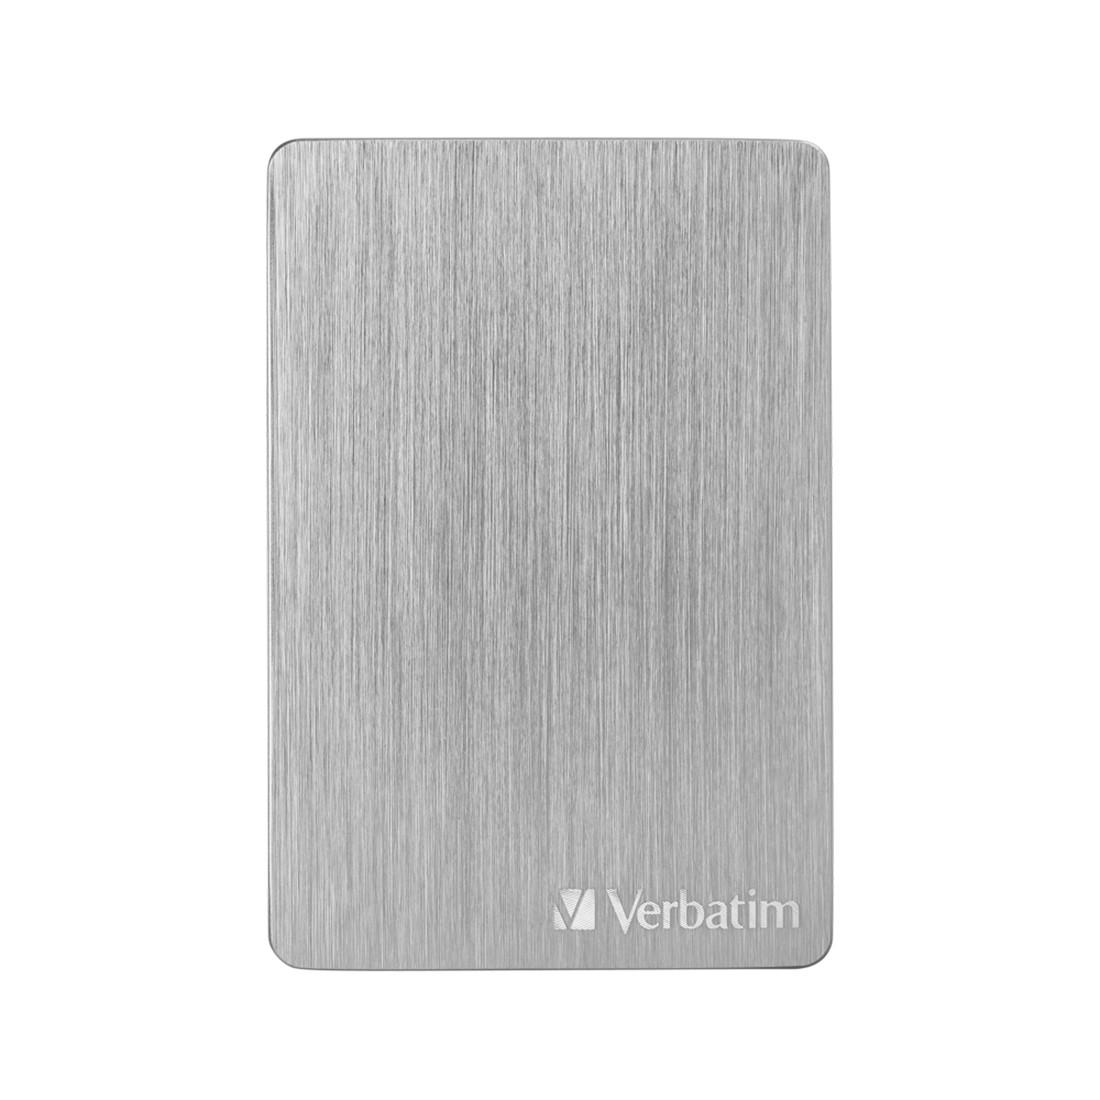 "Внешний жёсткий диск, Verbatim, 53666, 2TB, 2.5"", USB 3.2, Серебристый"